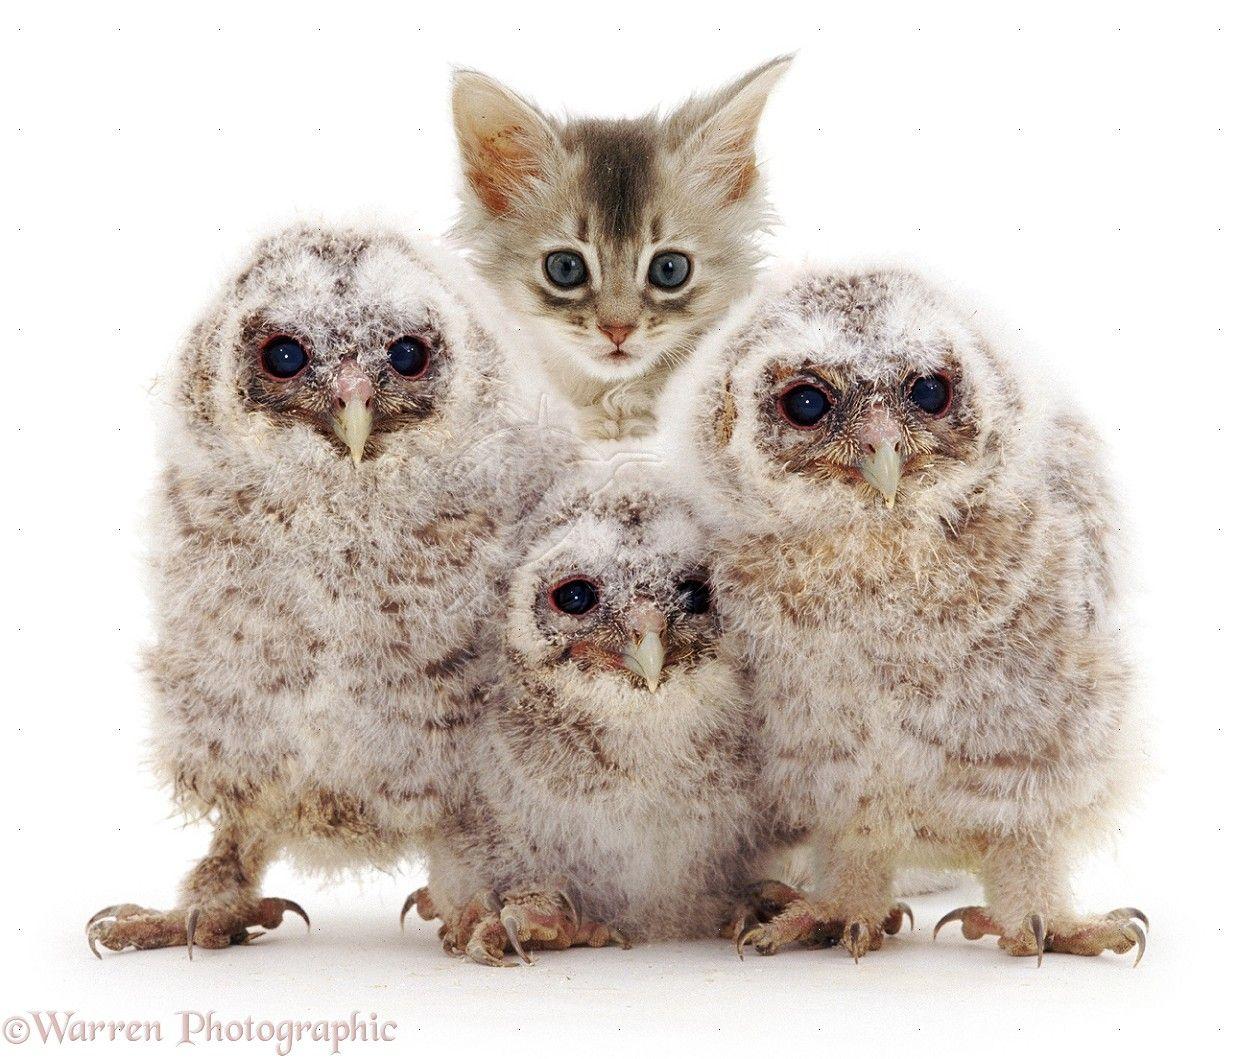 Owls Wp04192 Baby Tawny Owls With Kitten Tawny Owl Cute Baby Owl Owl